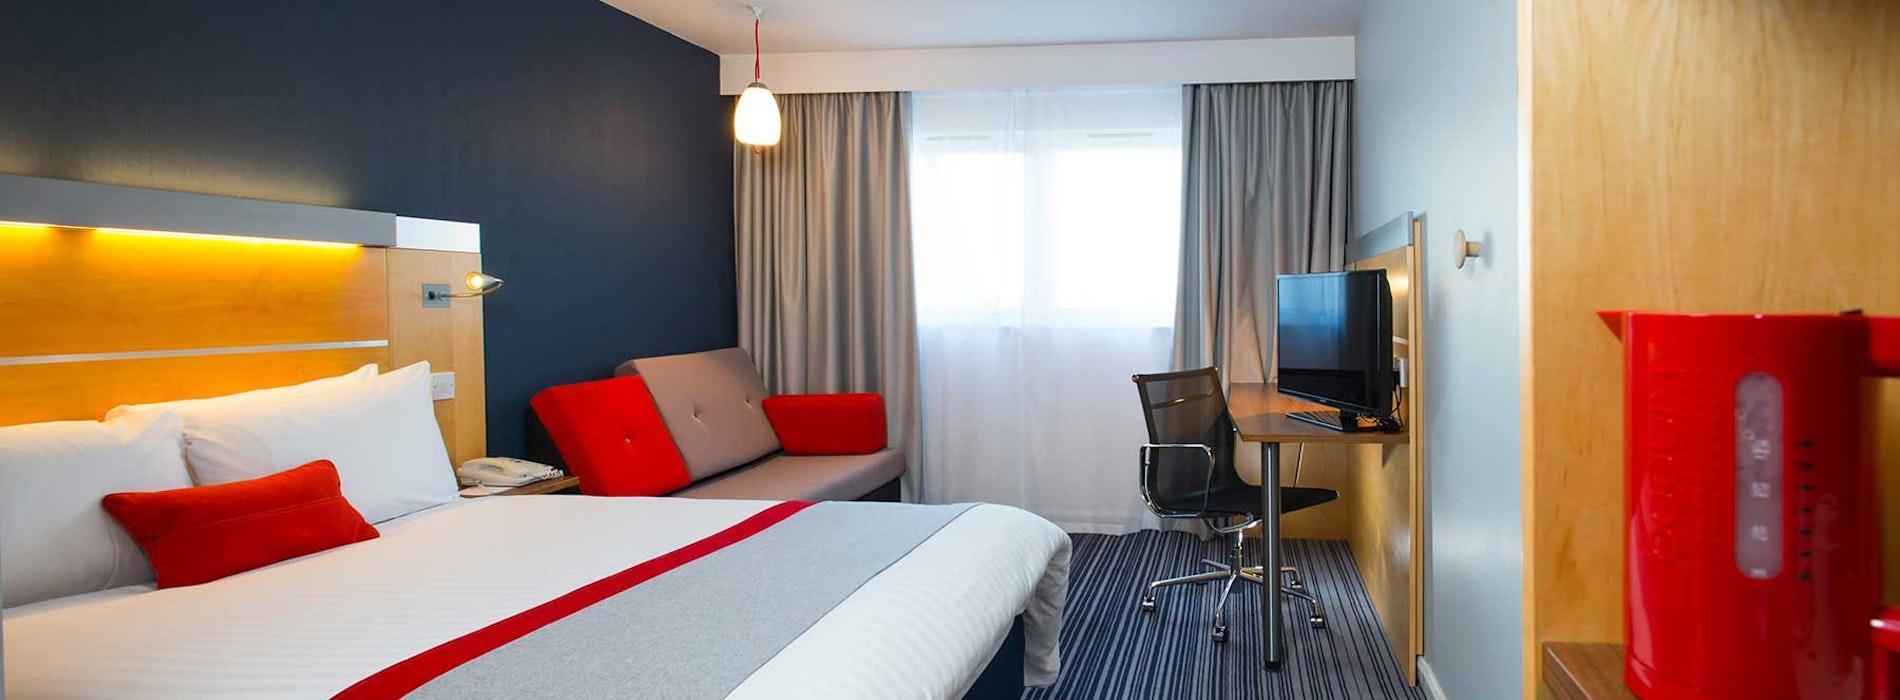 Holiday Inn Express Epsom Downs near Chessington World of Adventures Resort